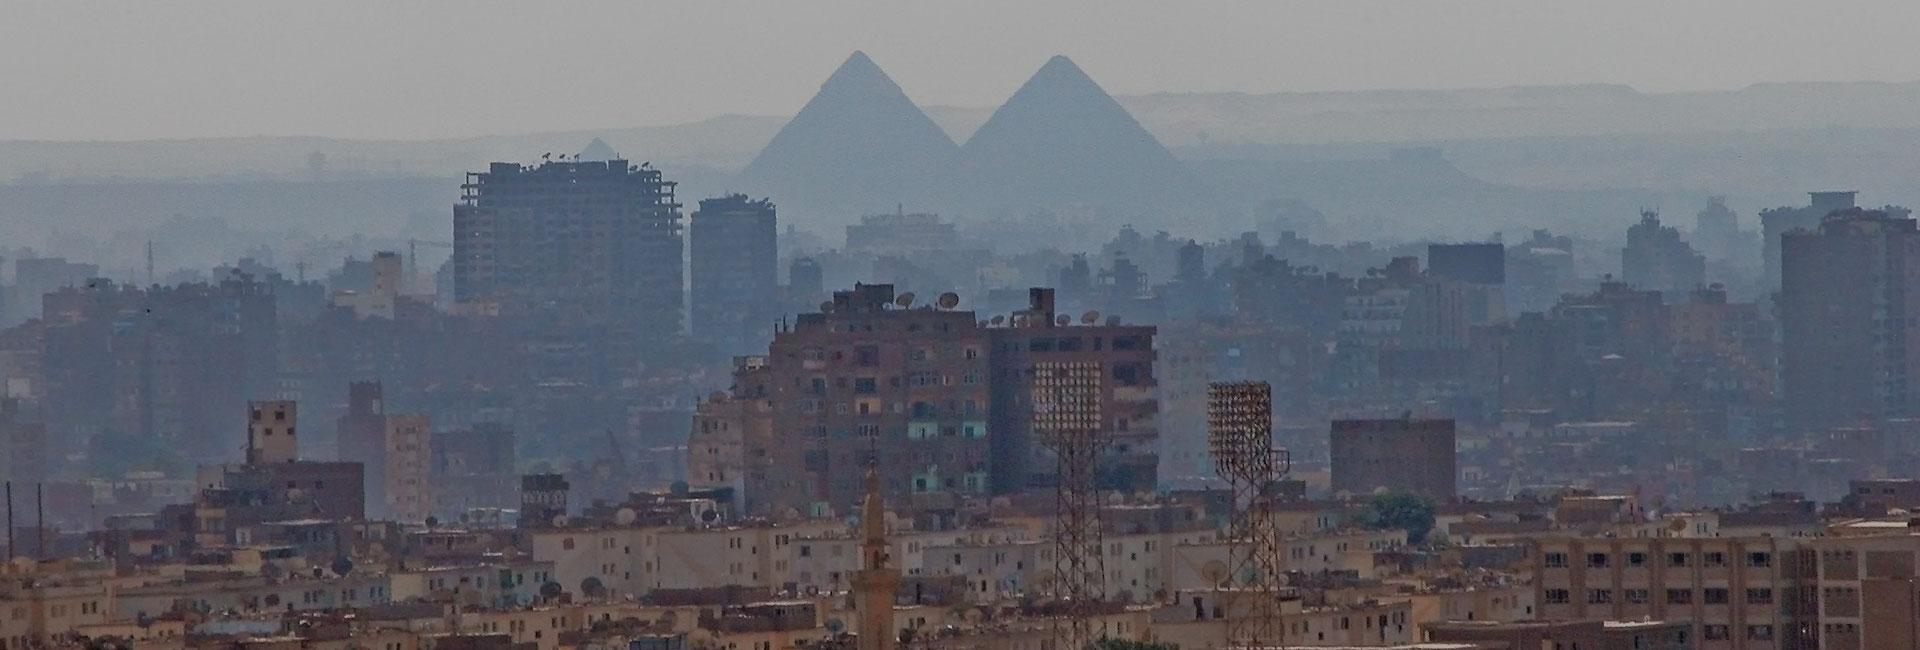 Cairo City Break package